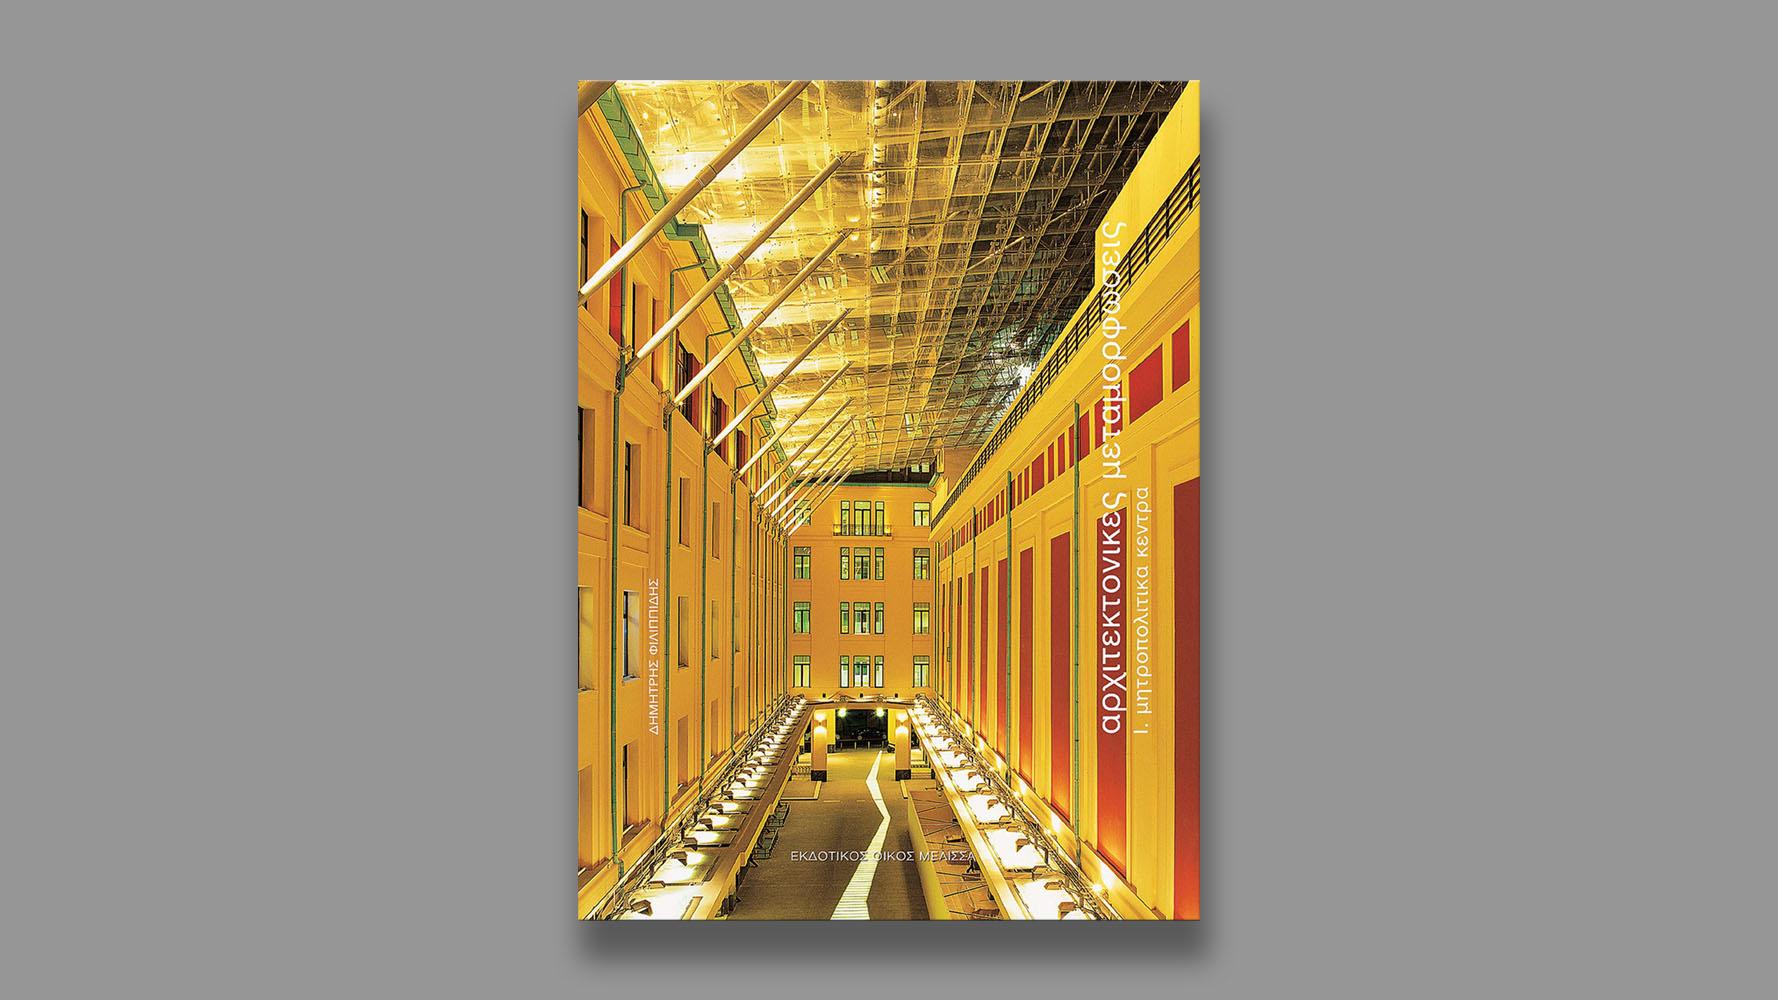 Architectural Transformations vol I, Melissa books, 2006